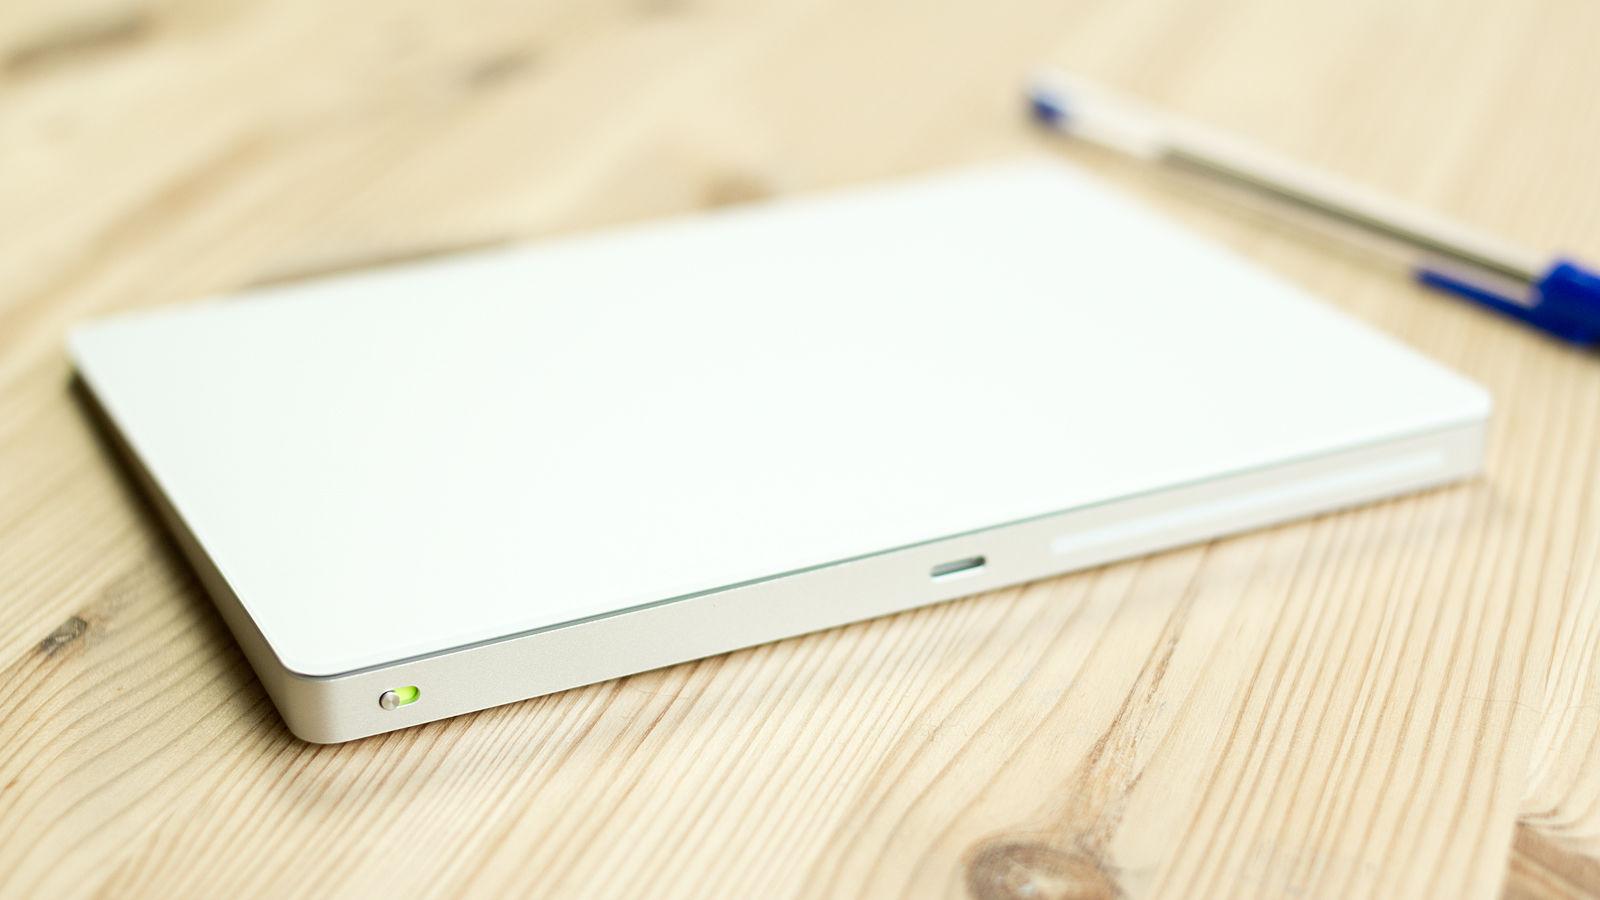 Apple Magic Trackpad 2 MJ2R2ZM/A - Беспроводной трекпад Apple